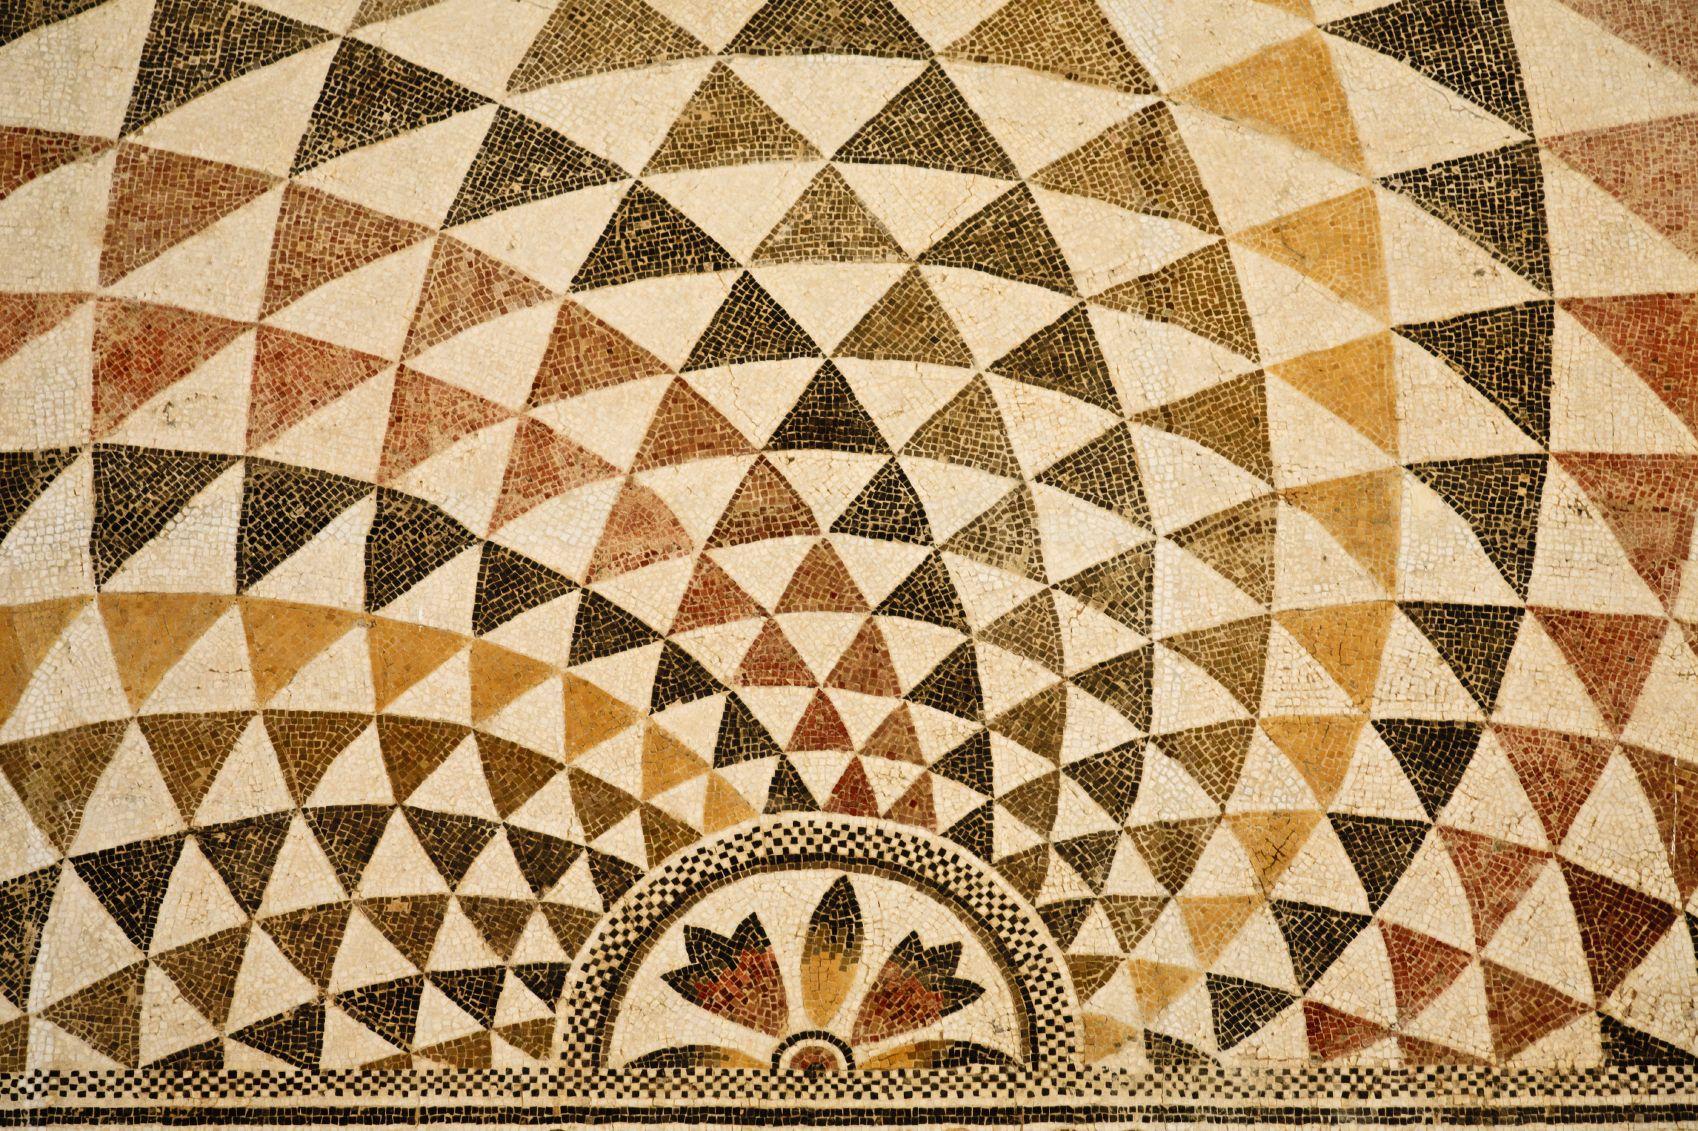 Native American Patterns Wallpaper